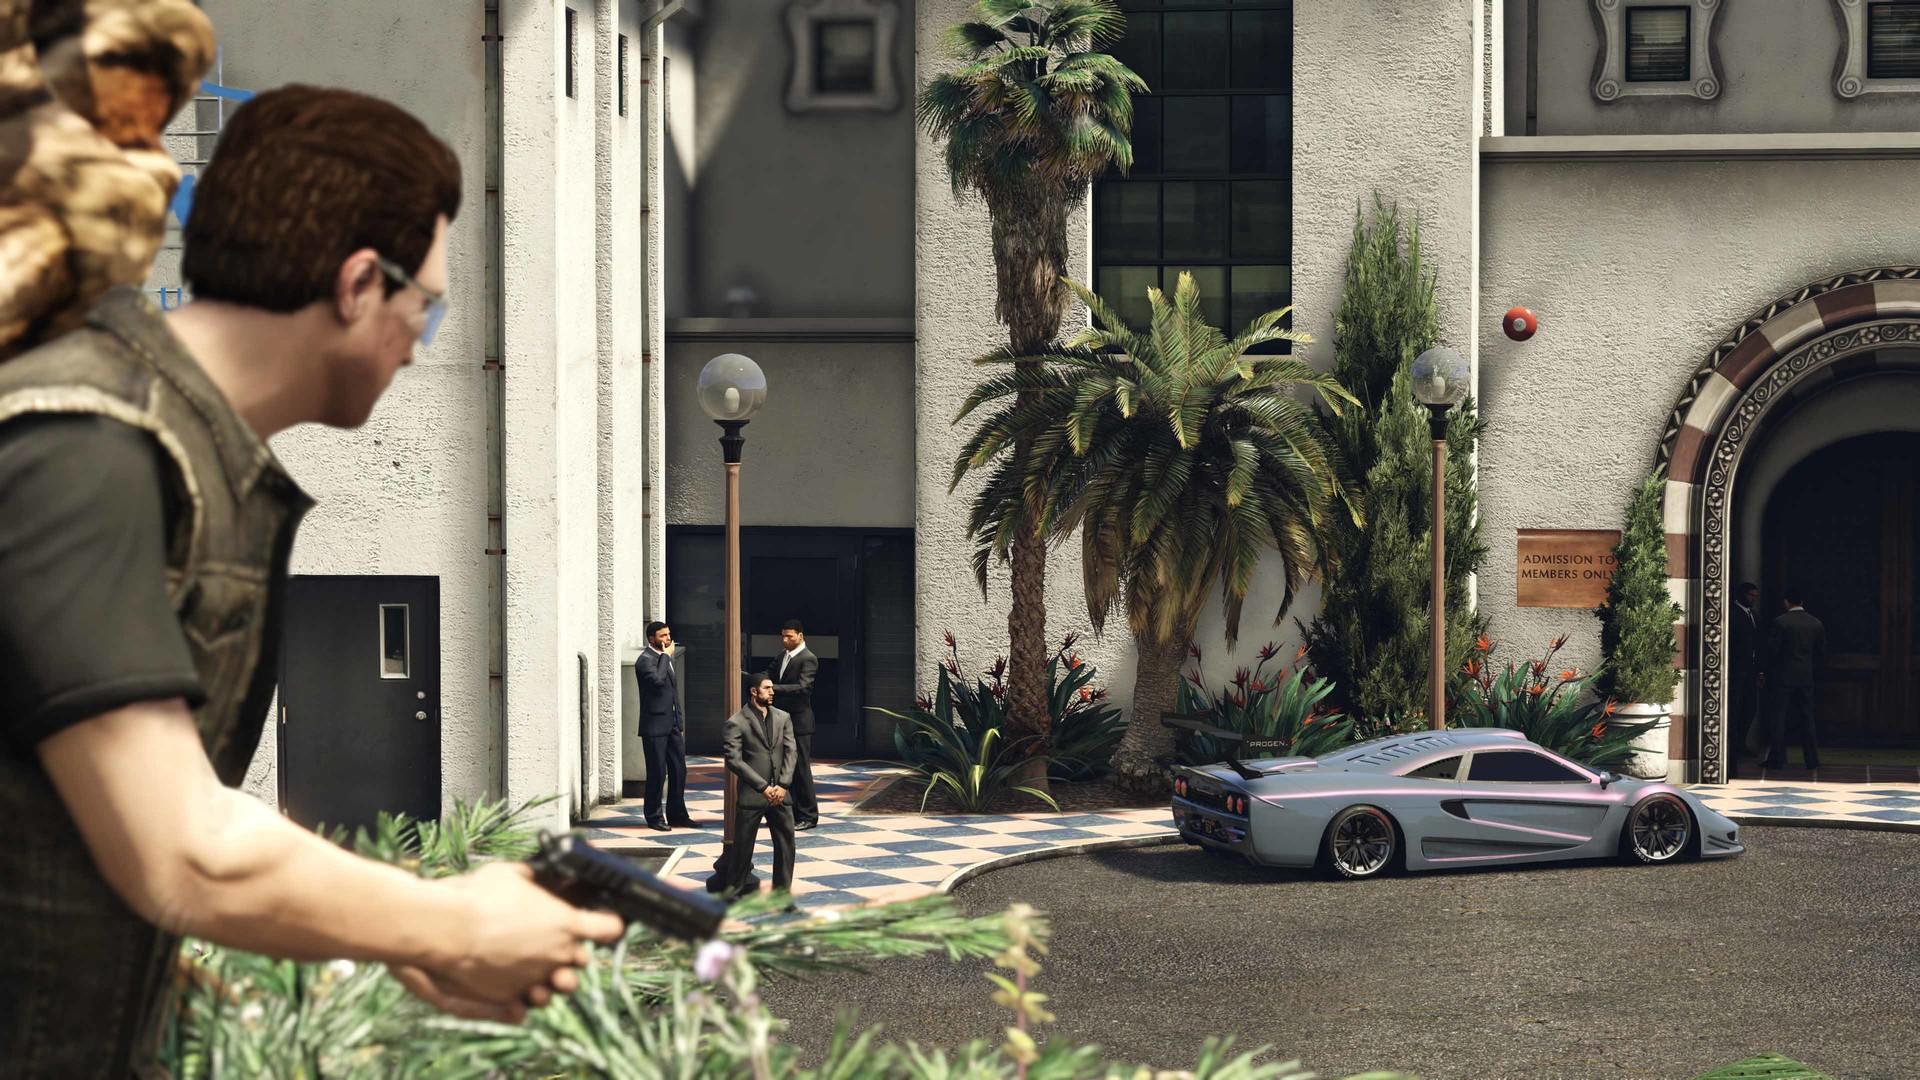 Claim GTA 5 - Grand Theft Auto 5 Premium Edition for free